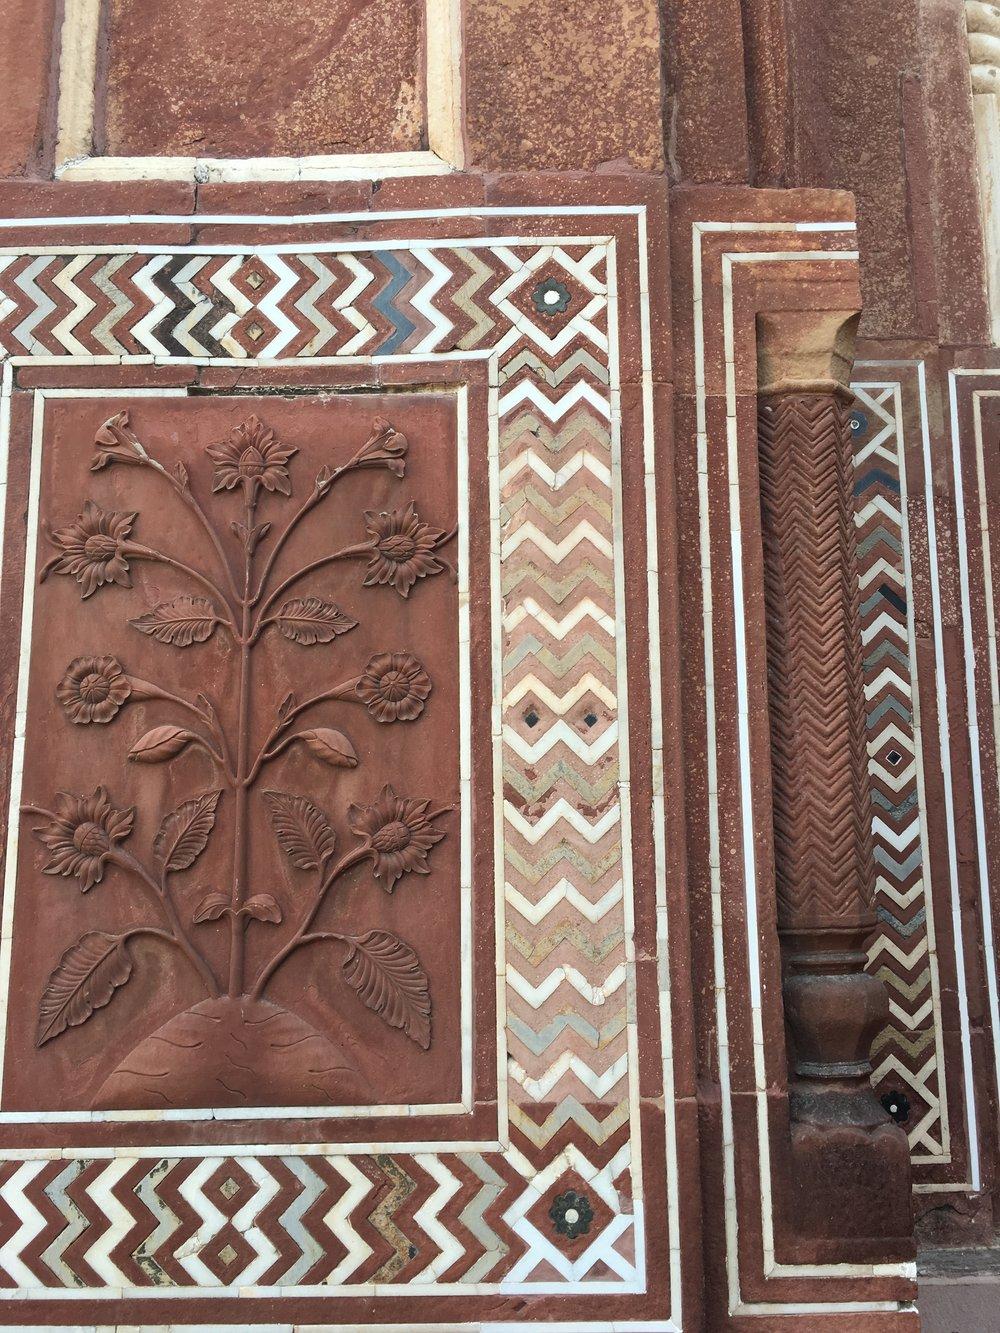 Details on the western gate, Taj Mahal